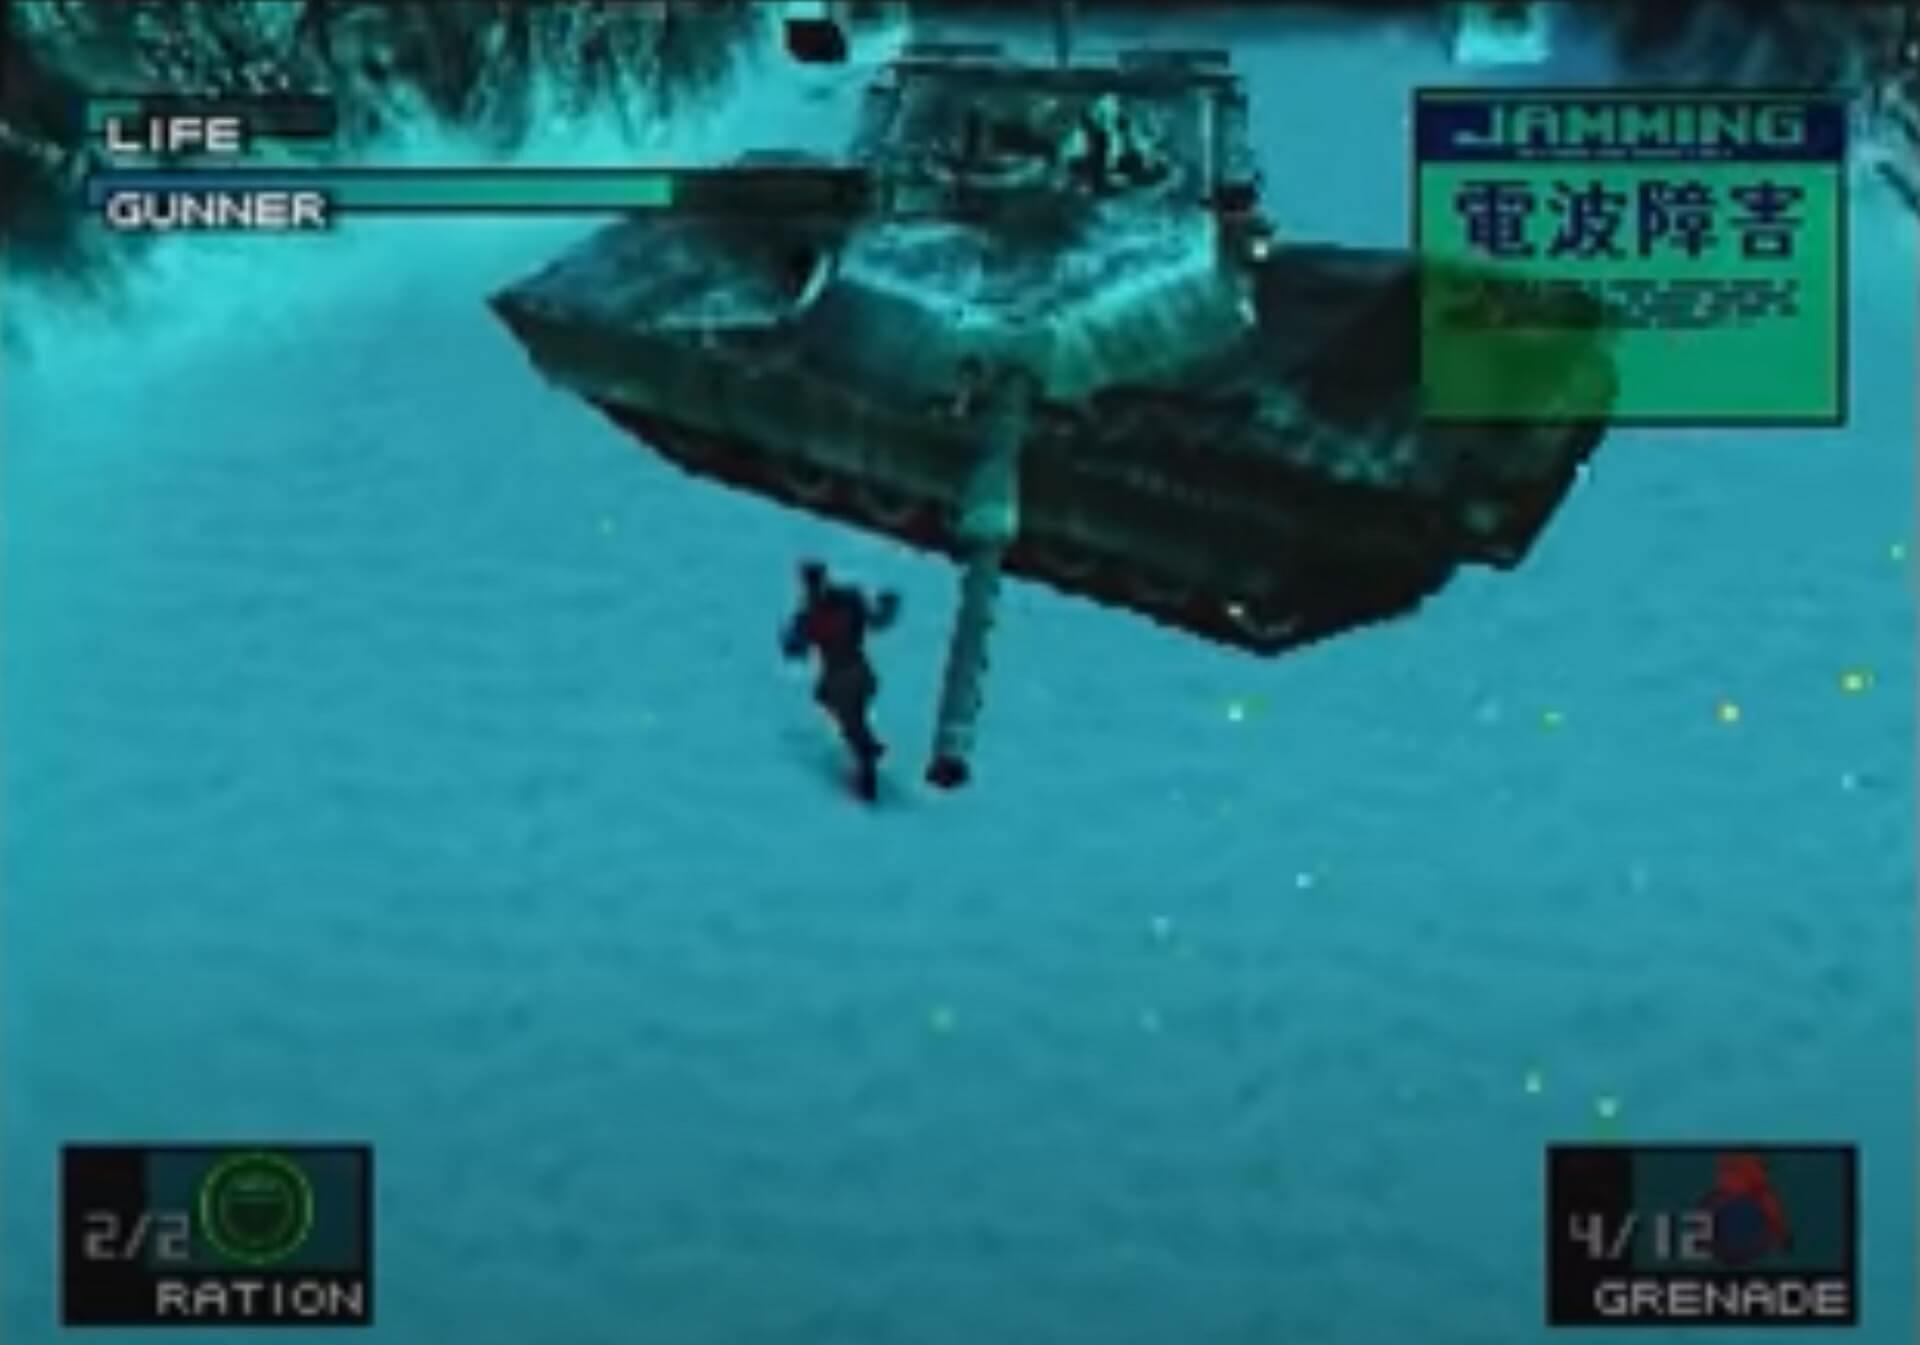 Metal Gear Solid: Solid Snake kämpft gegen einen Panzer